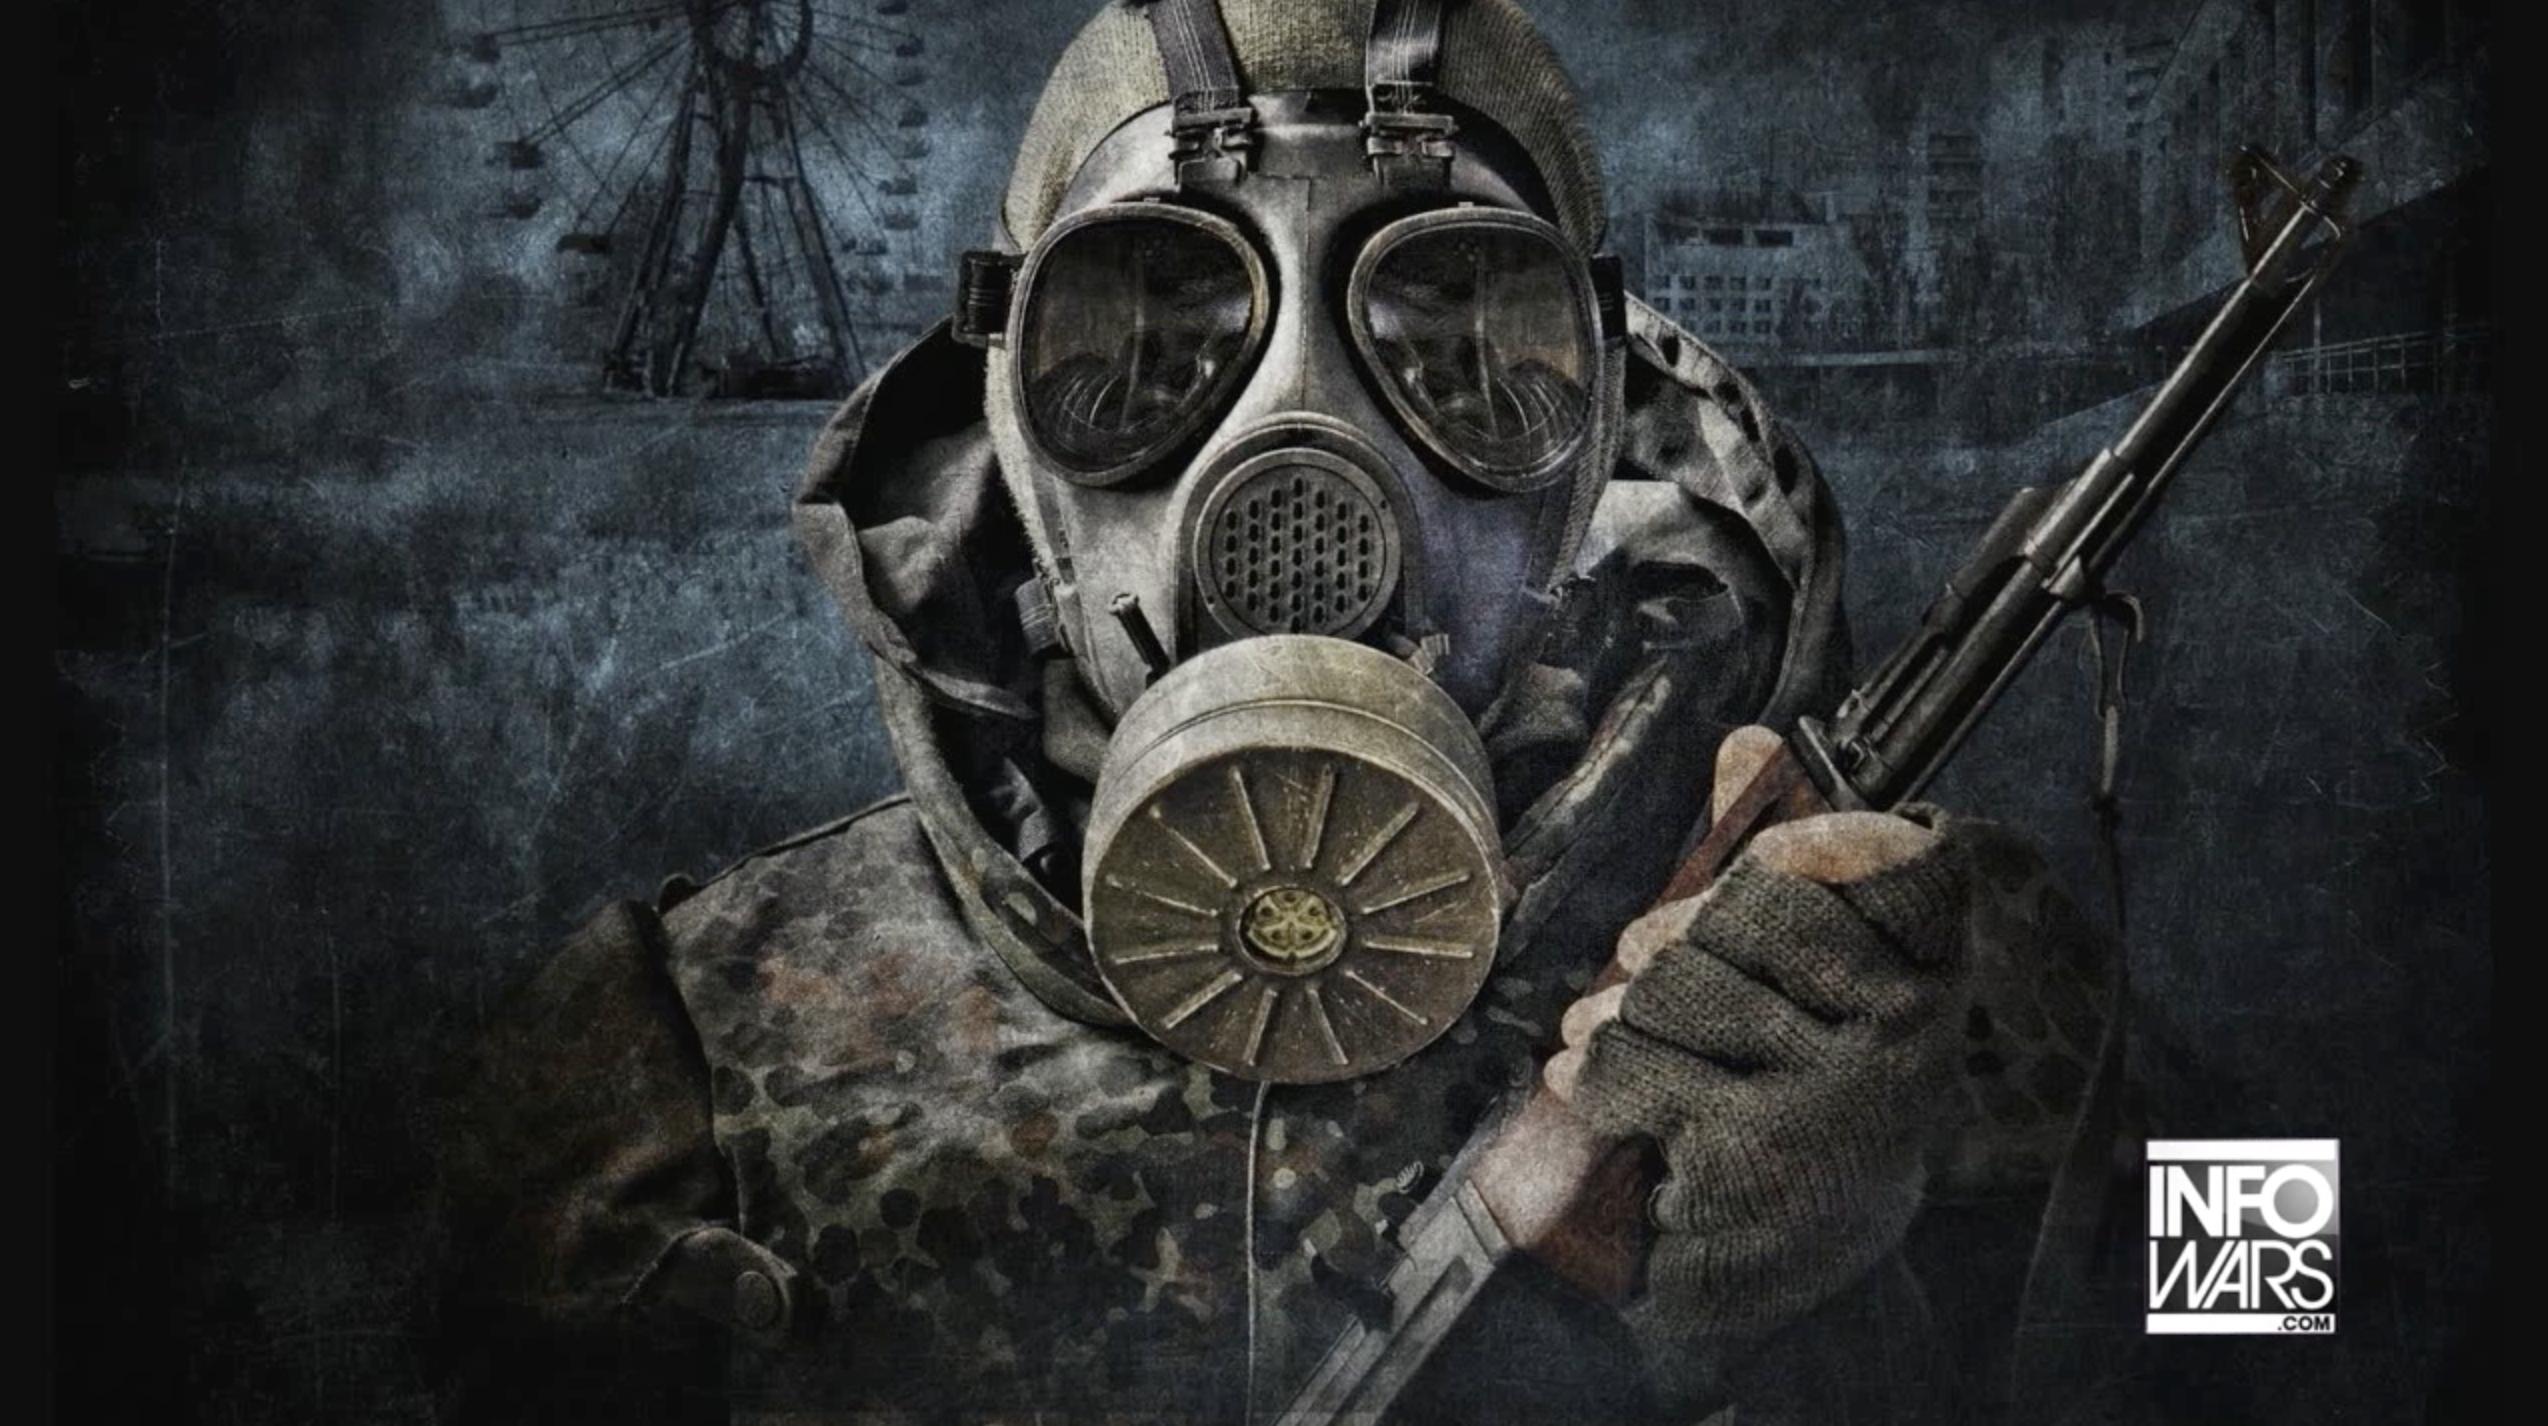 Masked Soldier Infowars 4 5 2020